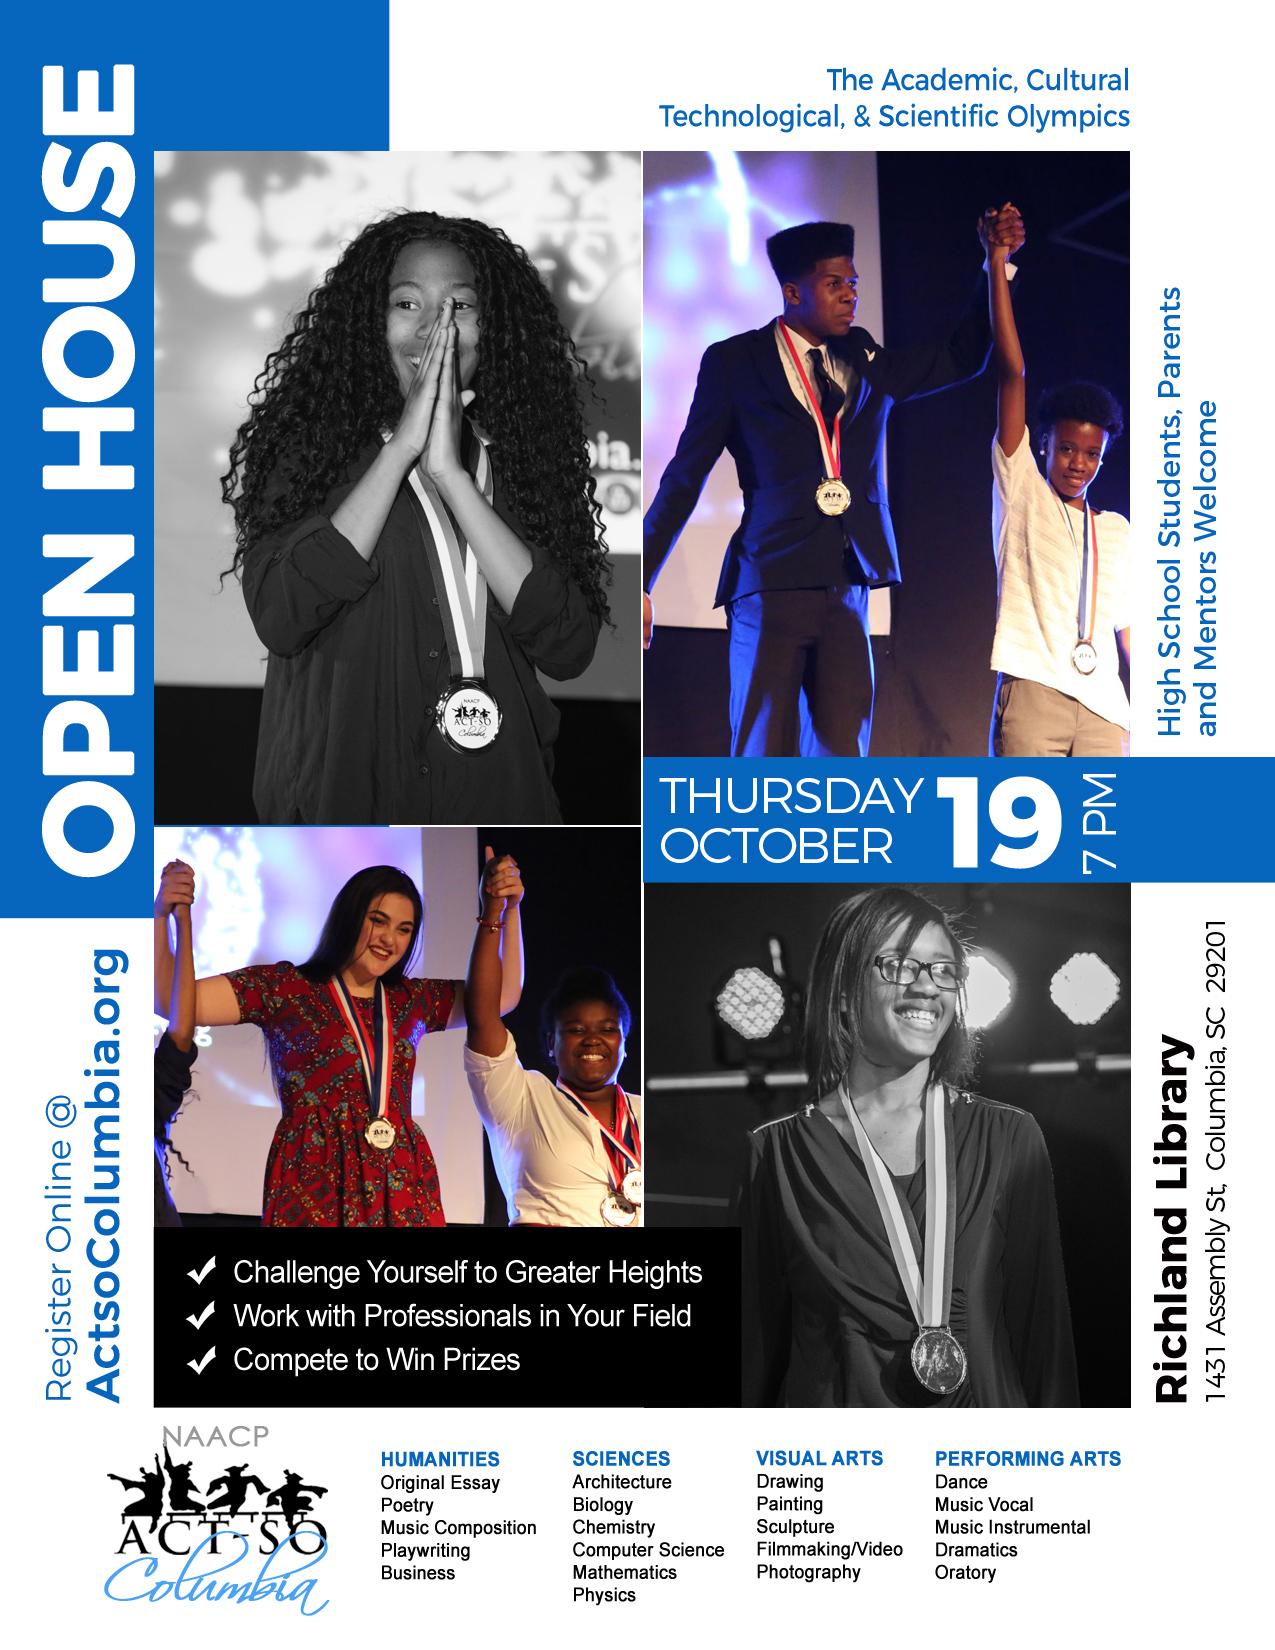 ACT-SO Open House Flyer